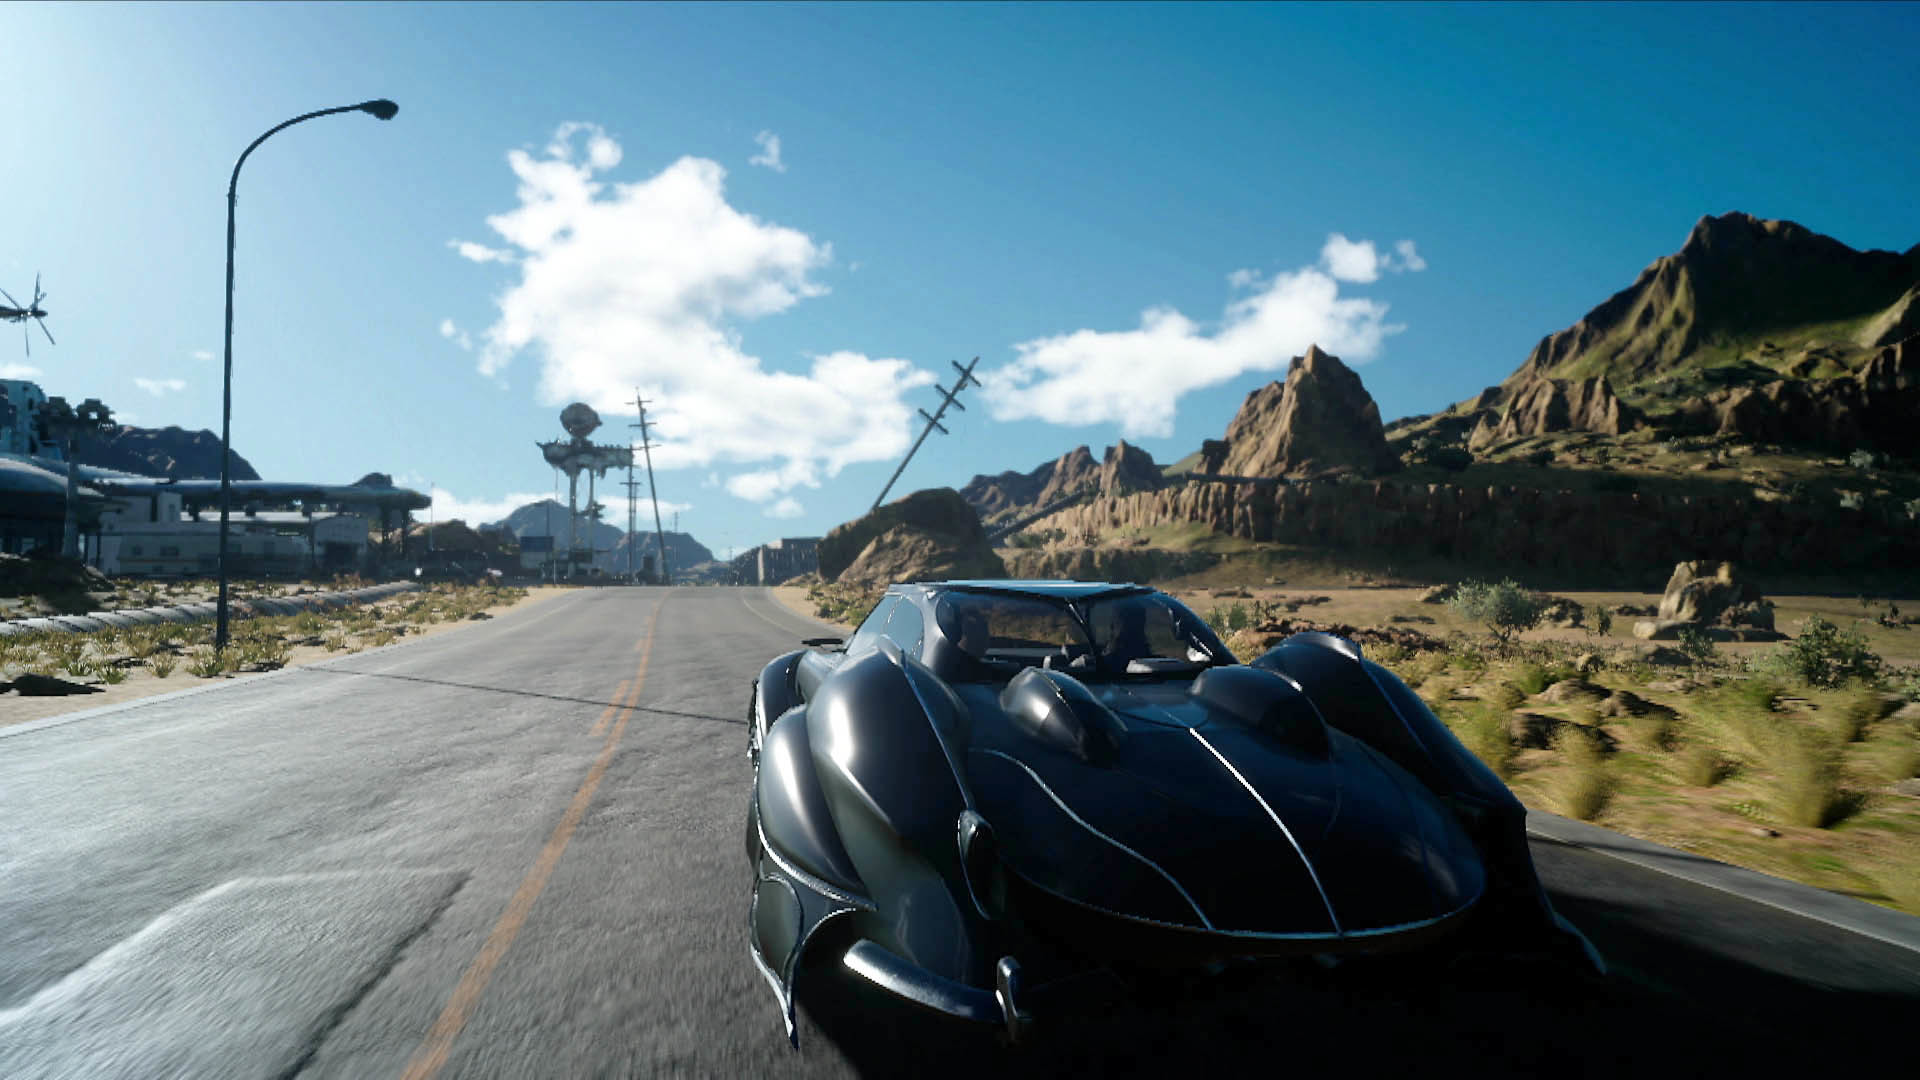 Regalia Type-F on the Road – Final Fantasy XV wallpaper